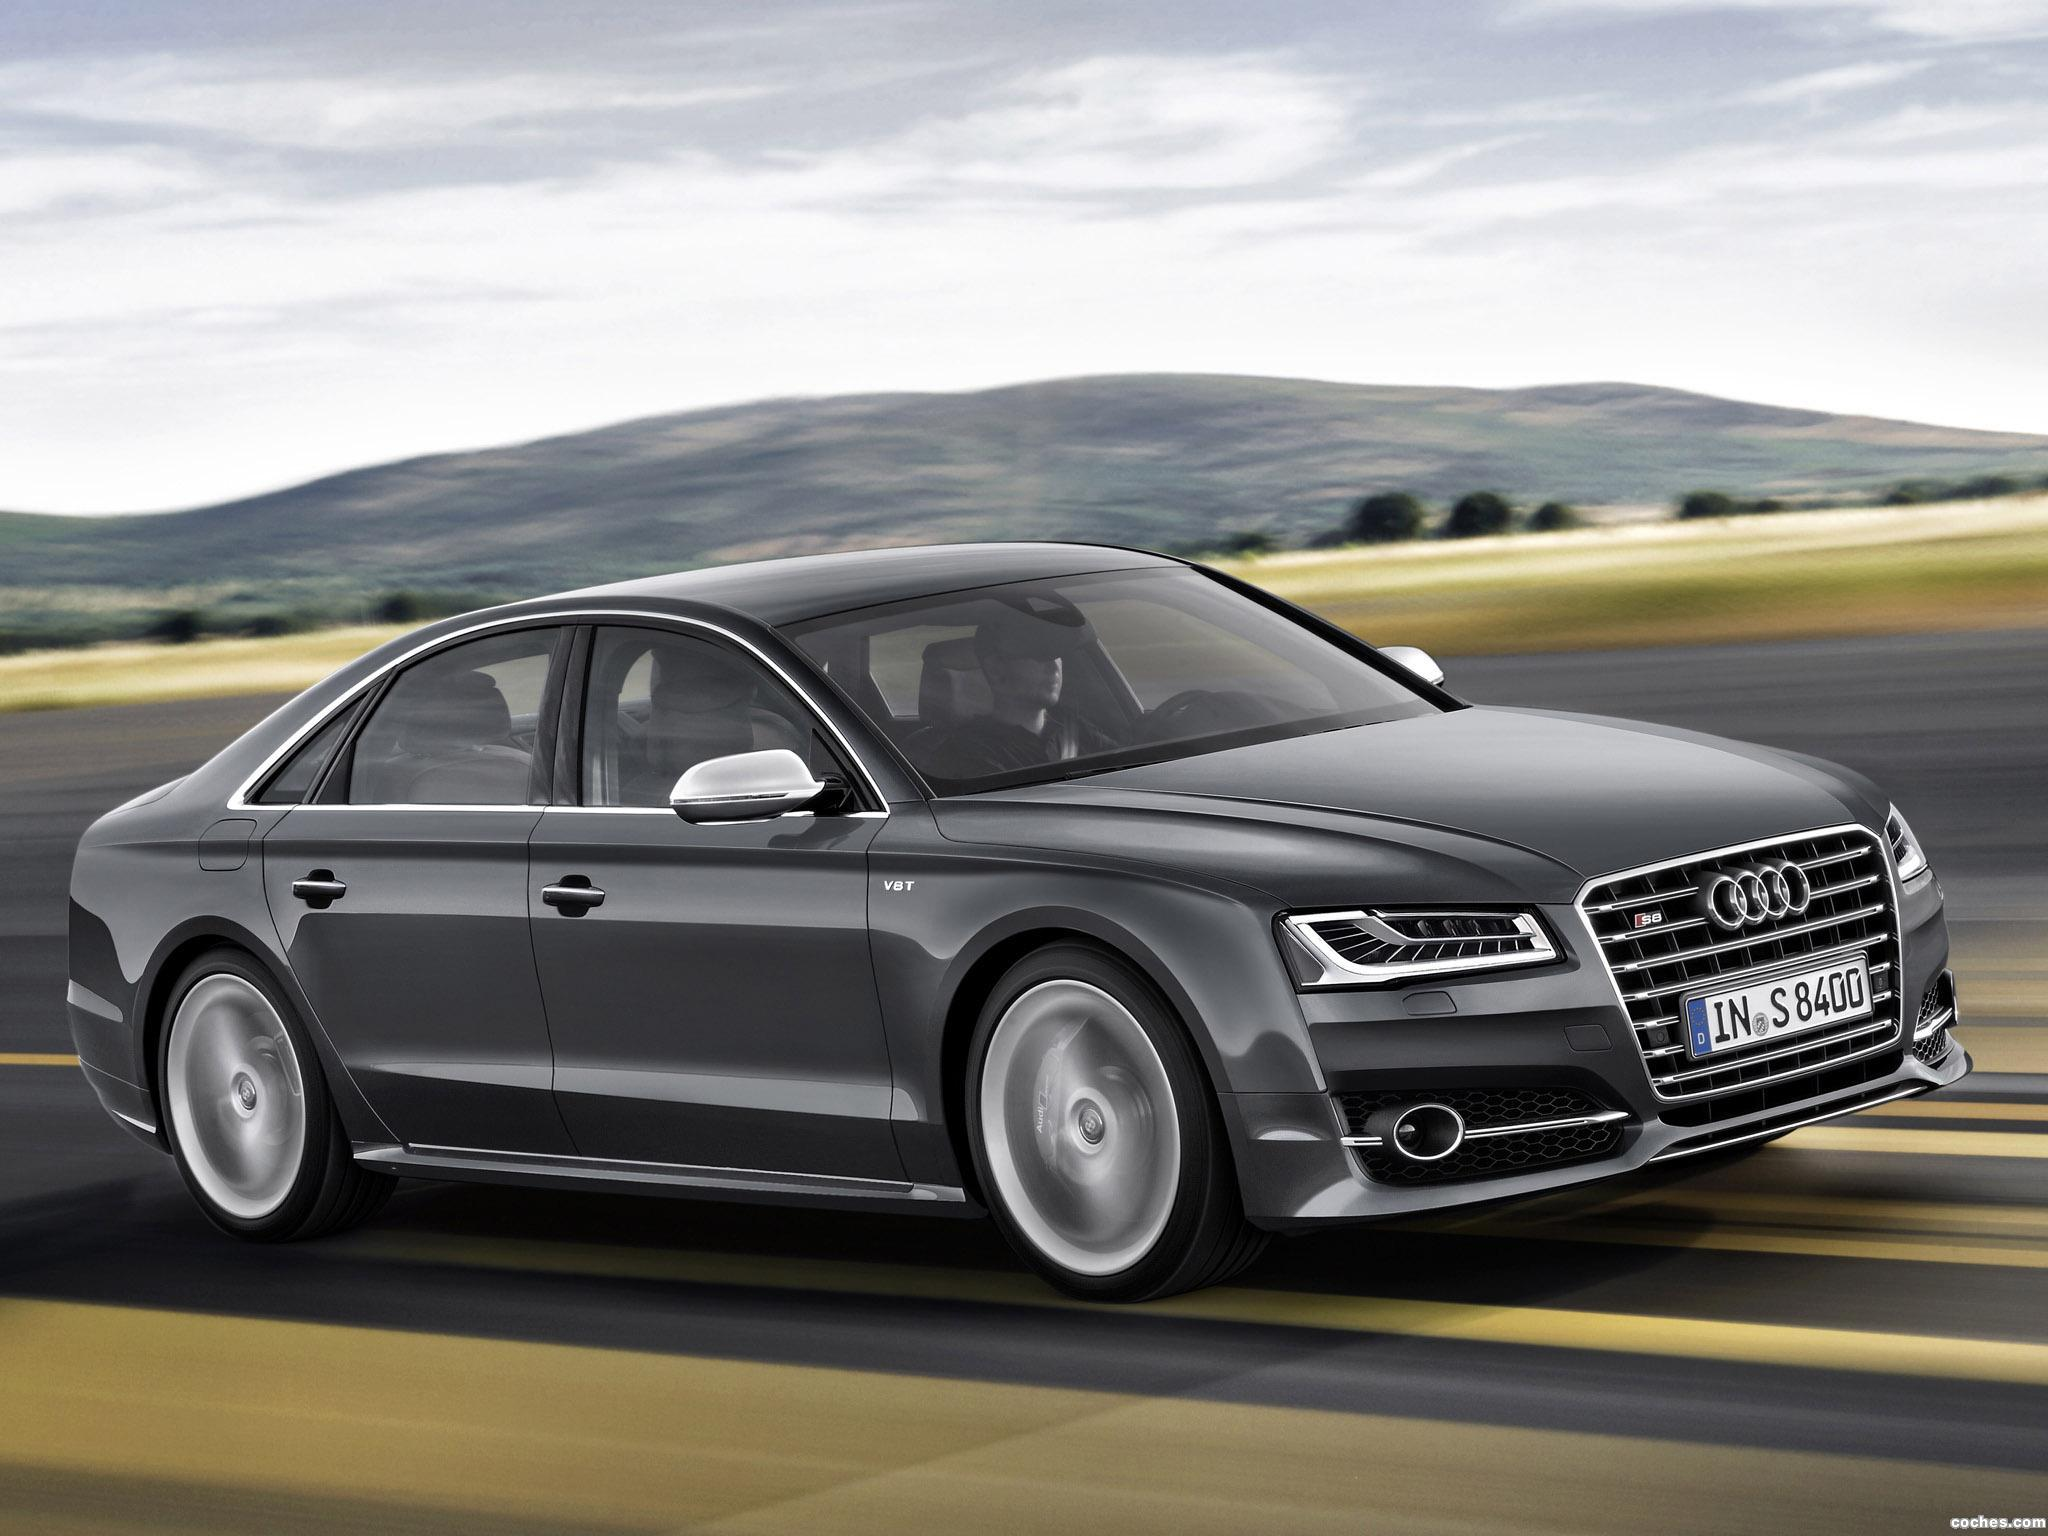 Foto 17 de Audi S8 D4 2013